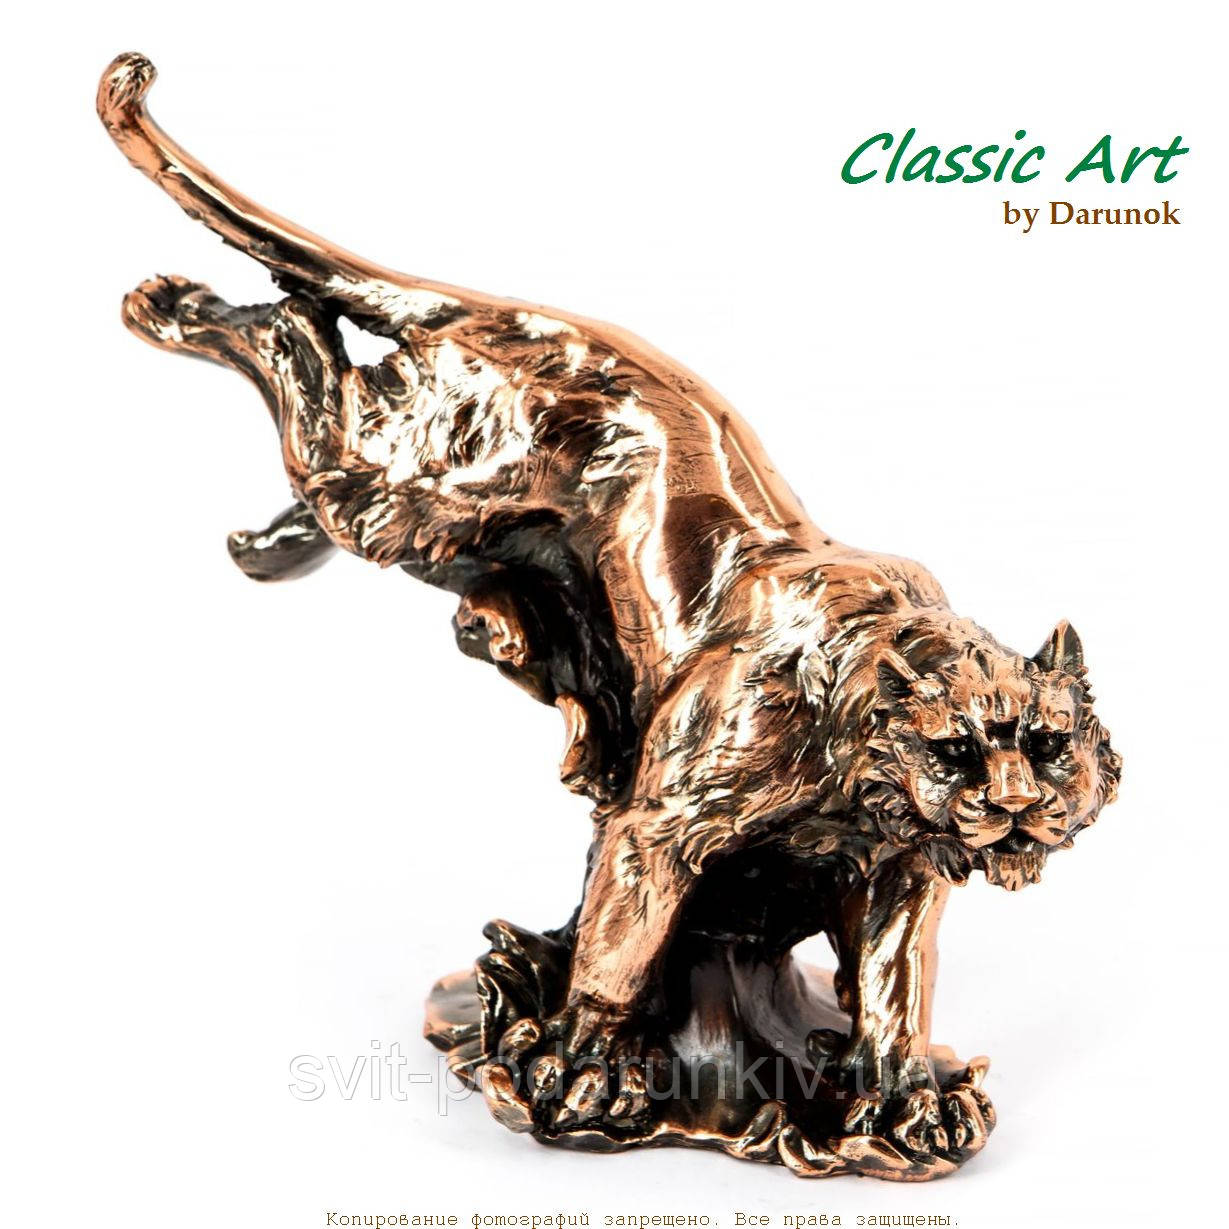 Статуэтка тигра в прыжке Classic Art 21 см ES095